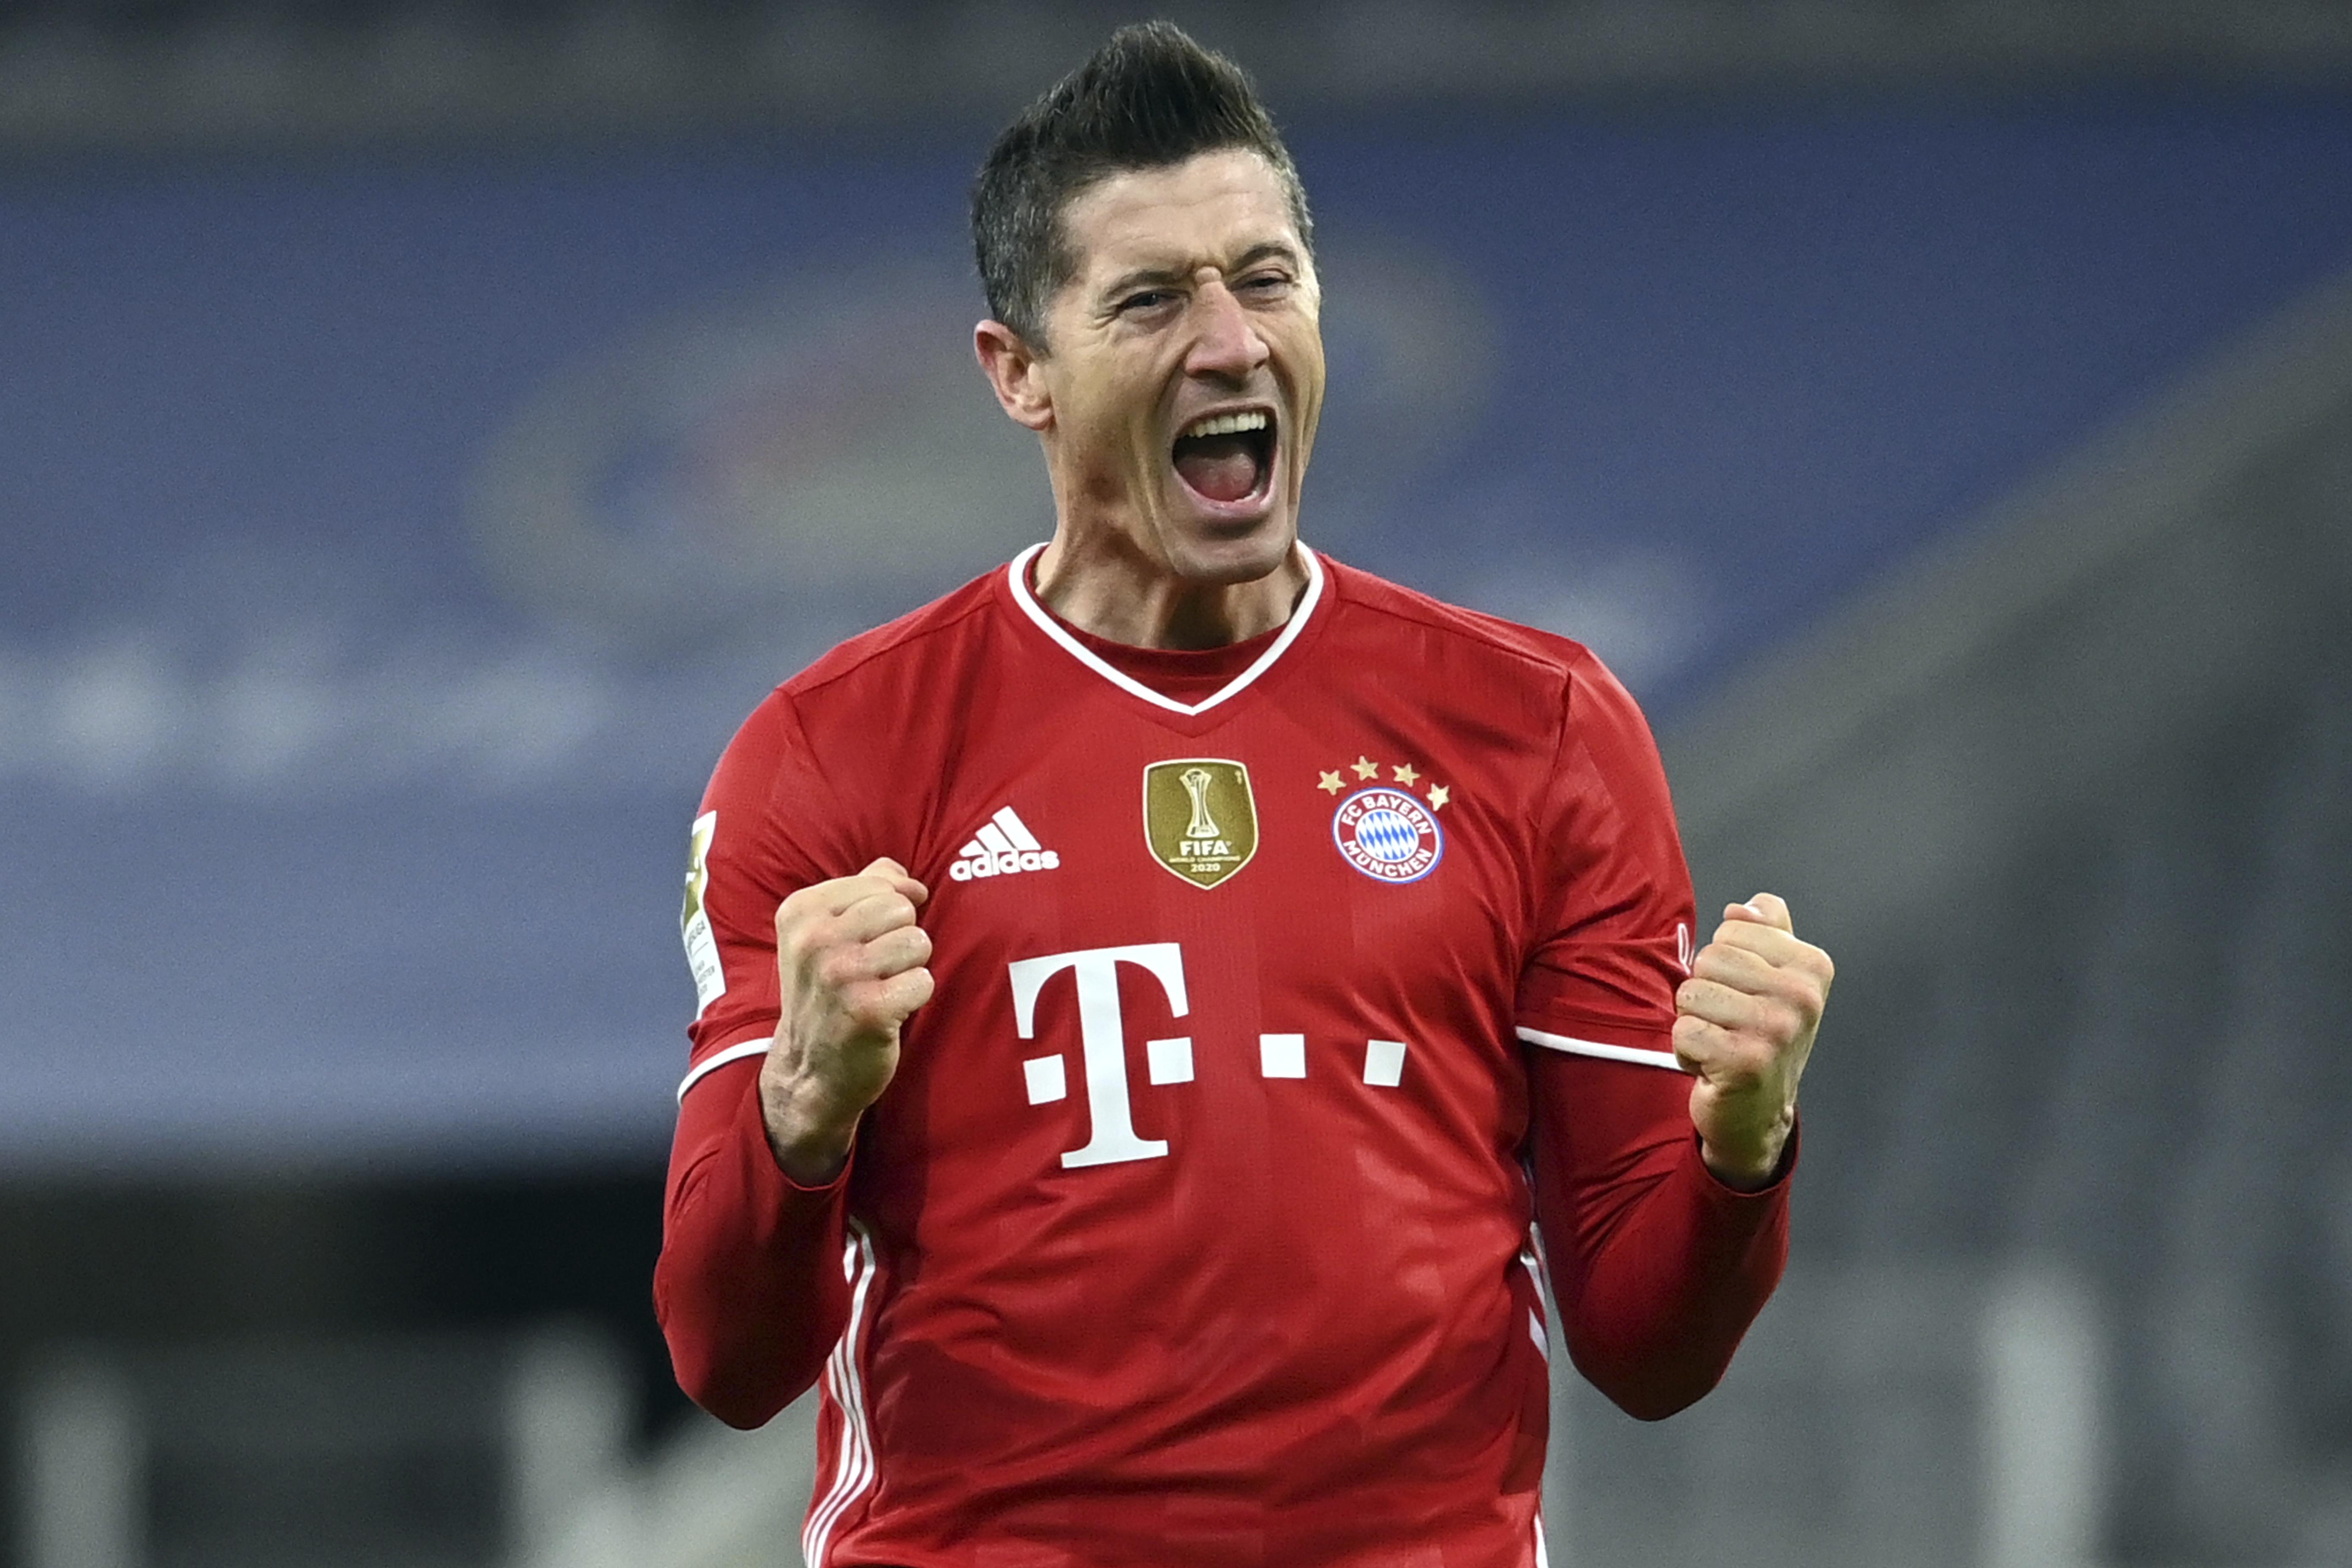 Red Bull Leipzig Vs Bayern Munich Free Live Stream 4 3 21 Watch Bundesliga Online Time Usa Tv Channel Nj Com